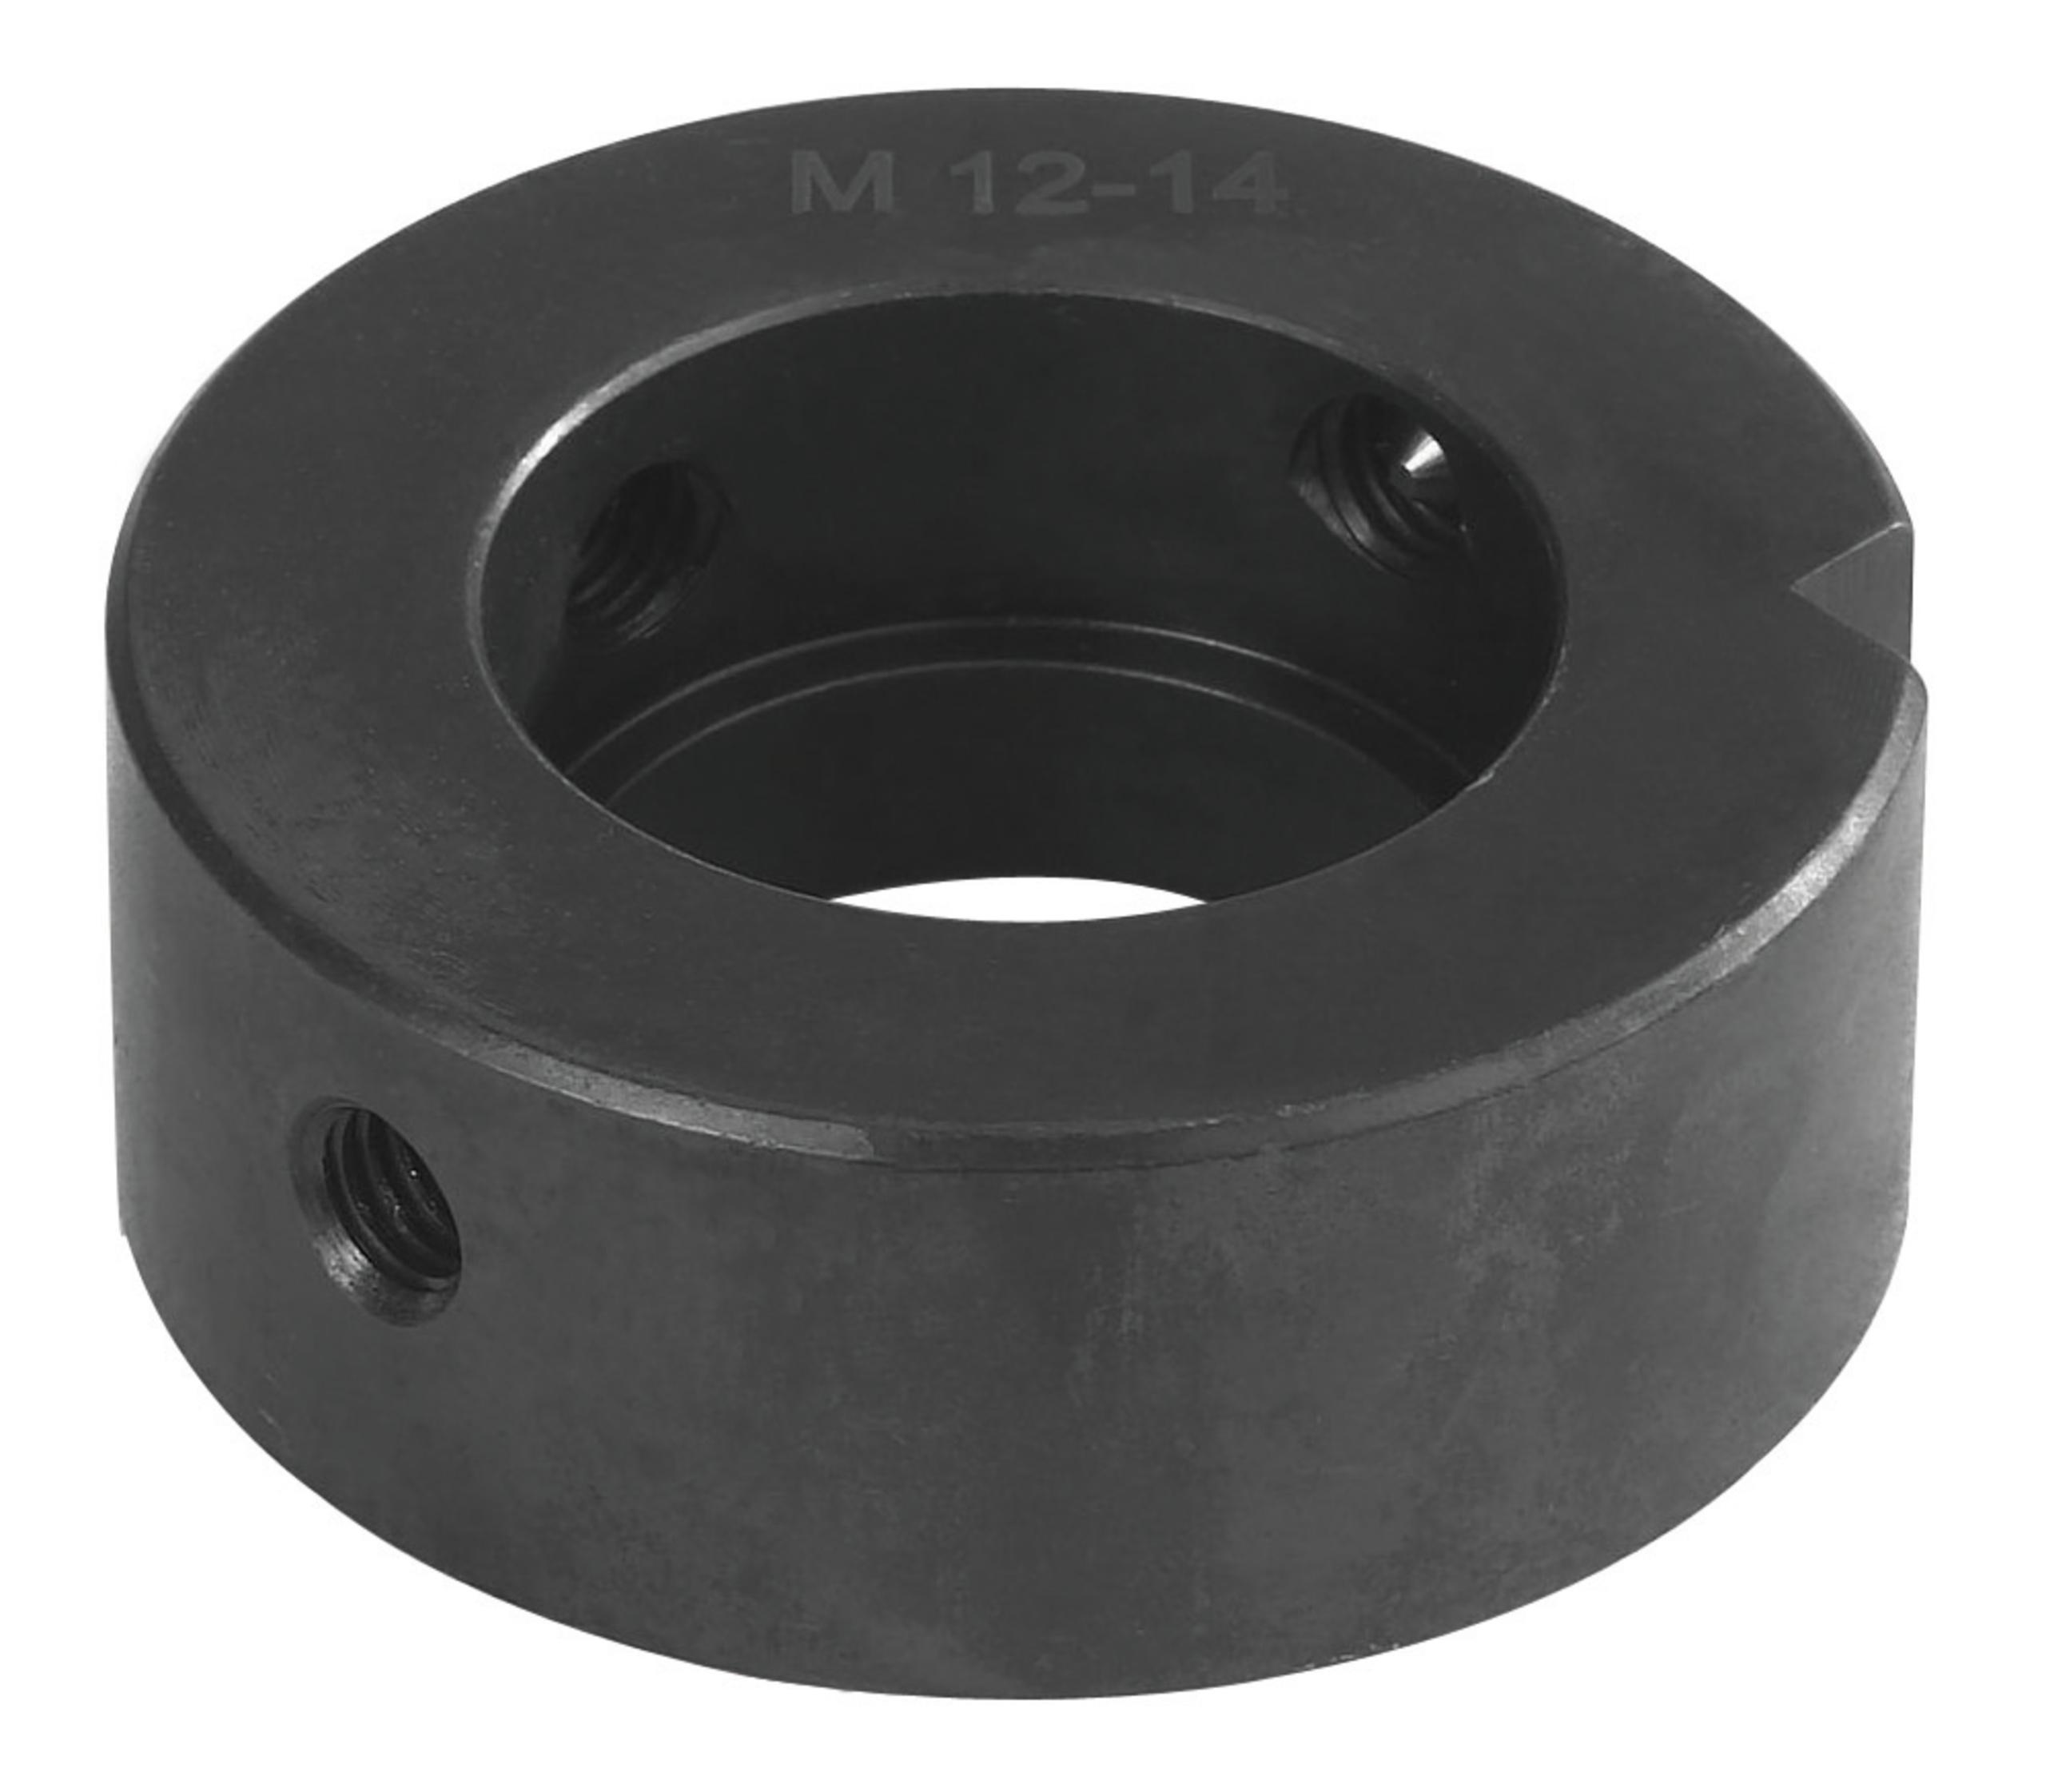 <br/>Intermediate ring M 12-14